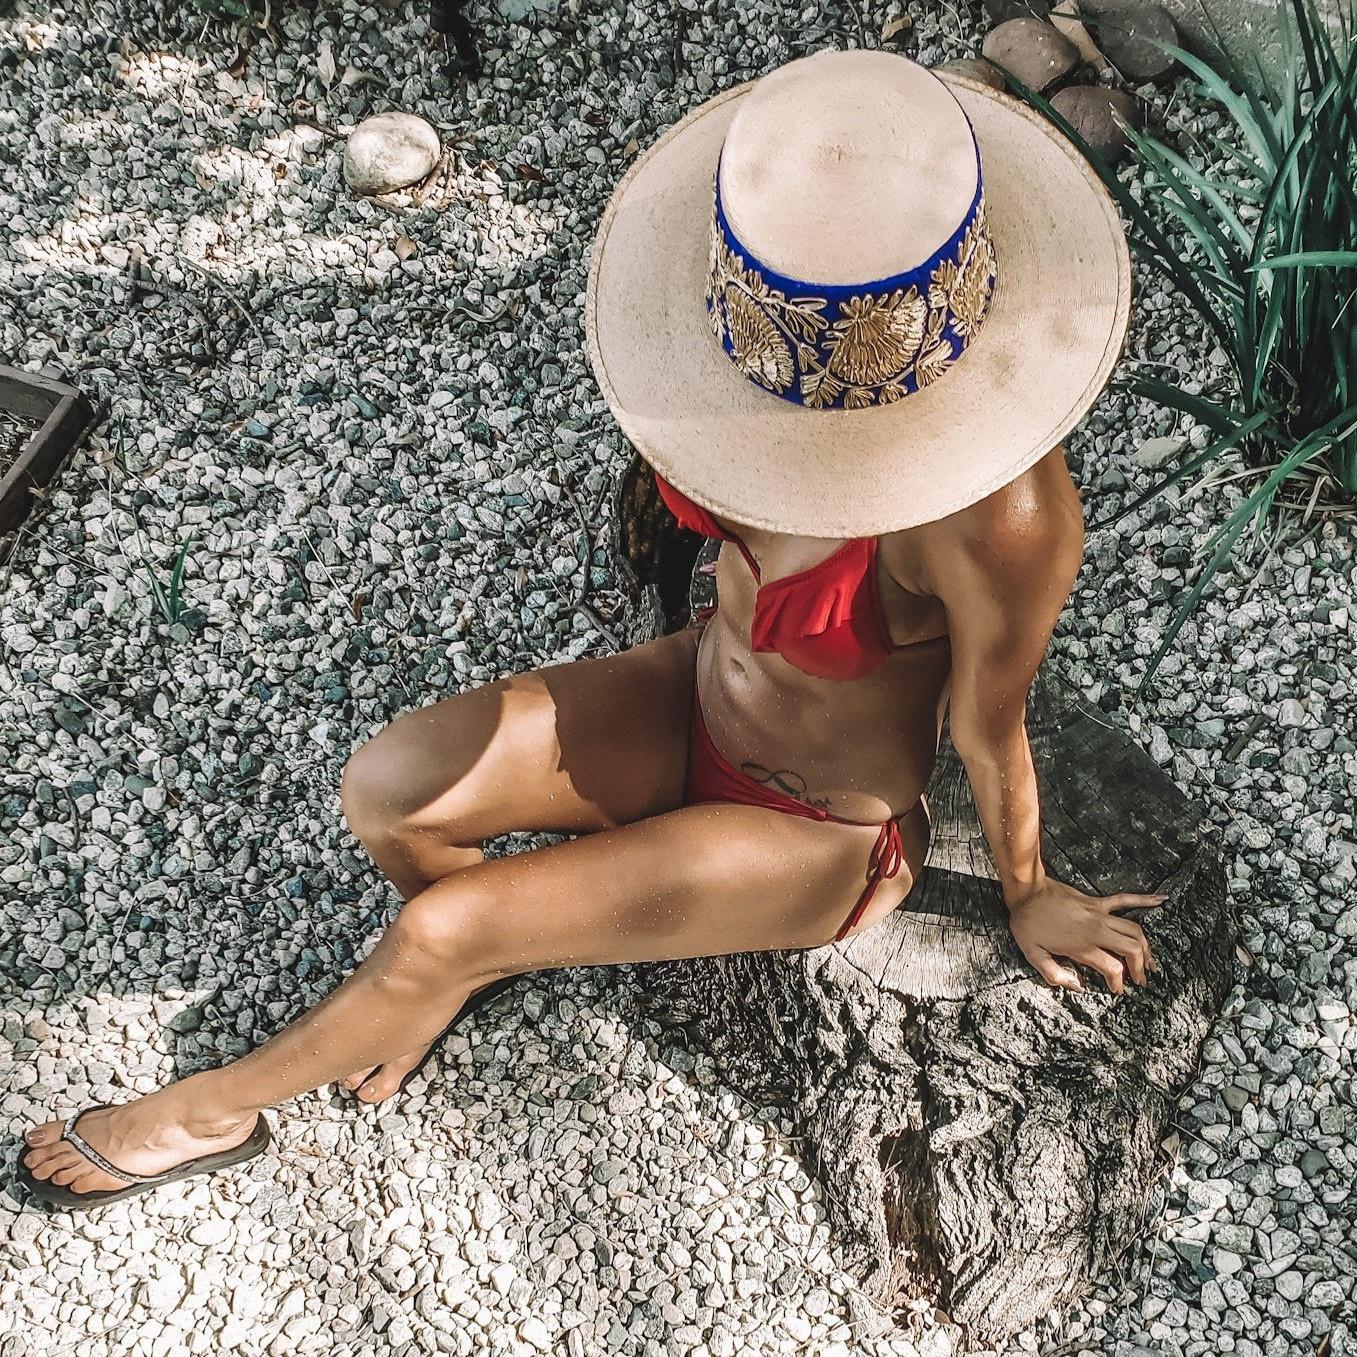 Ariella Ferrer conscious lifestyle brandjessicaferrerdesigns on etsy